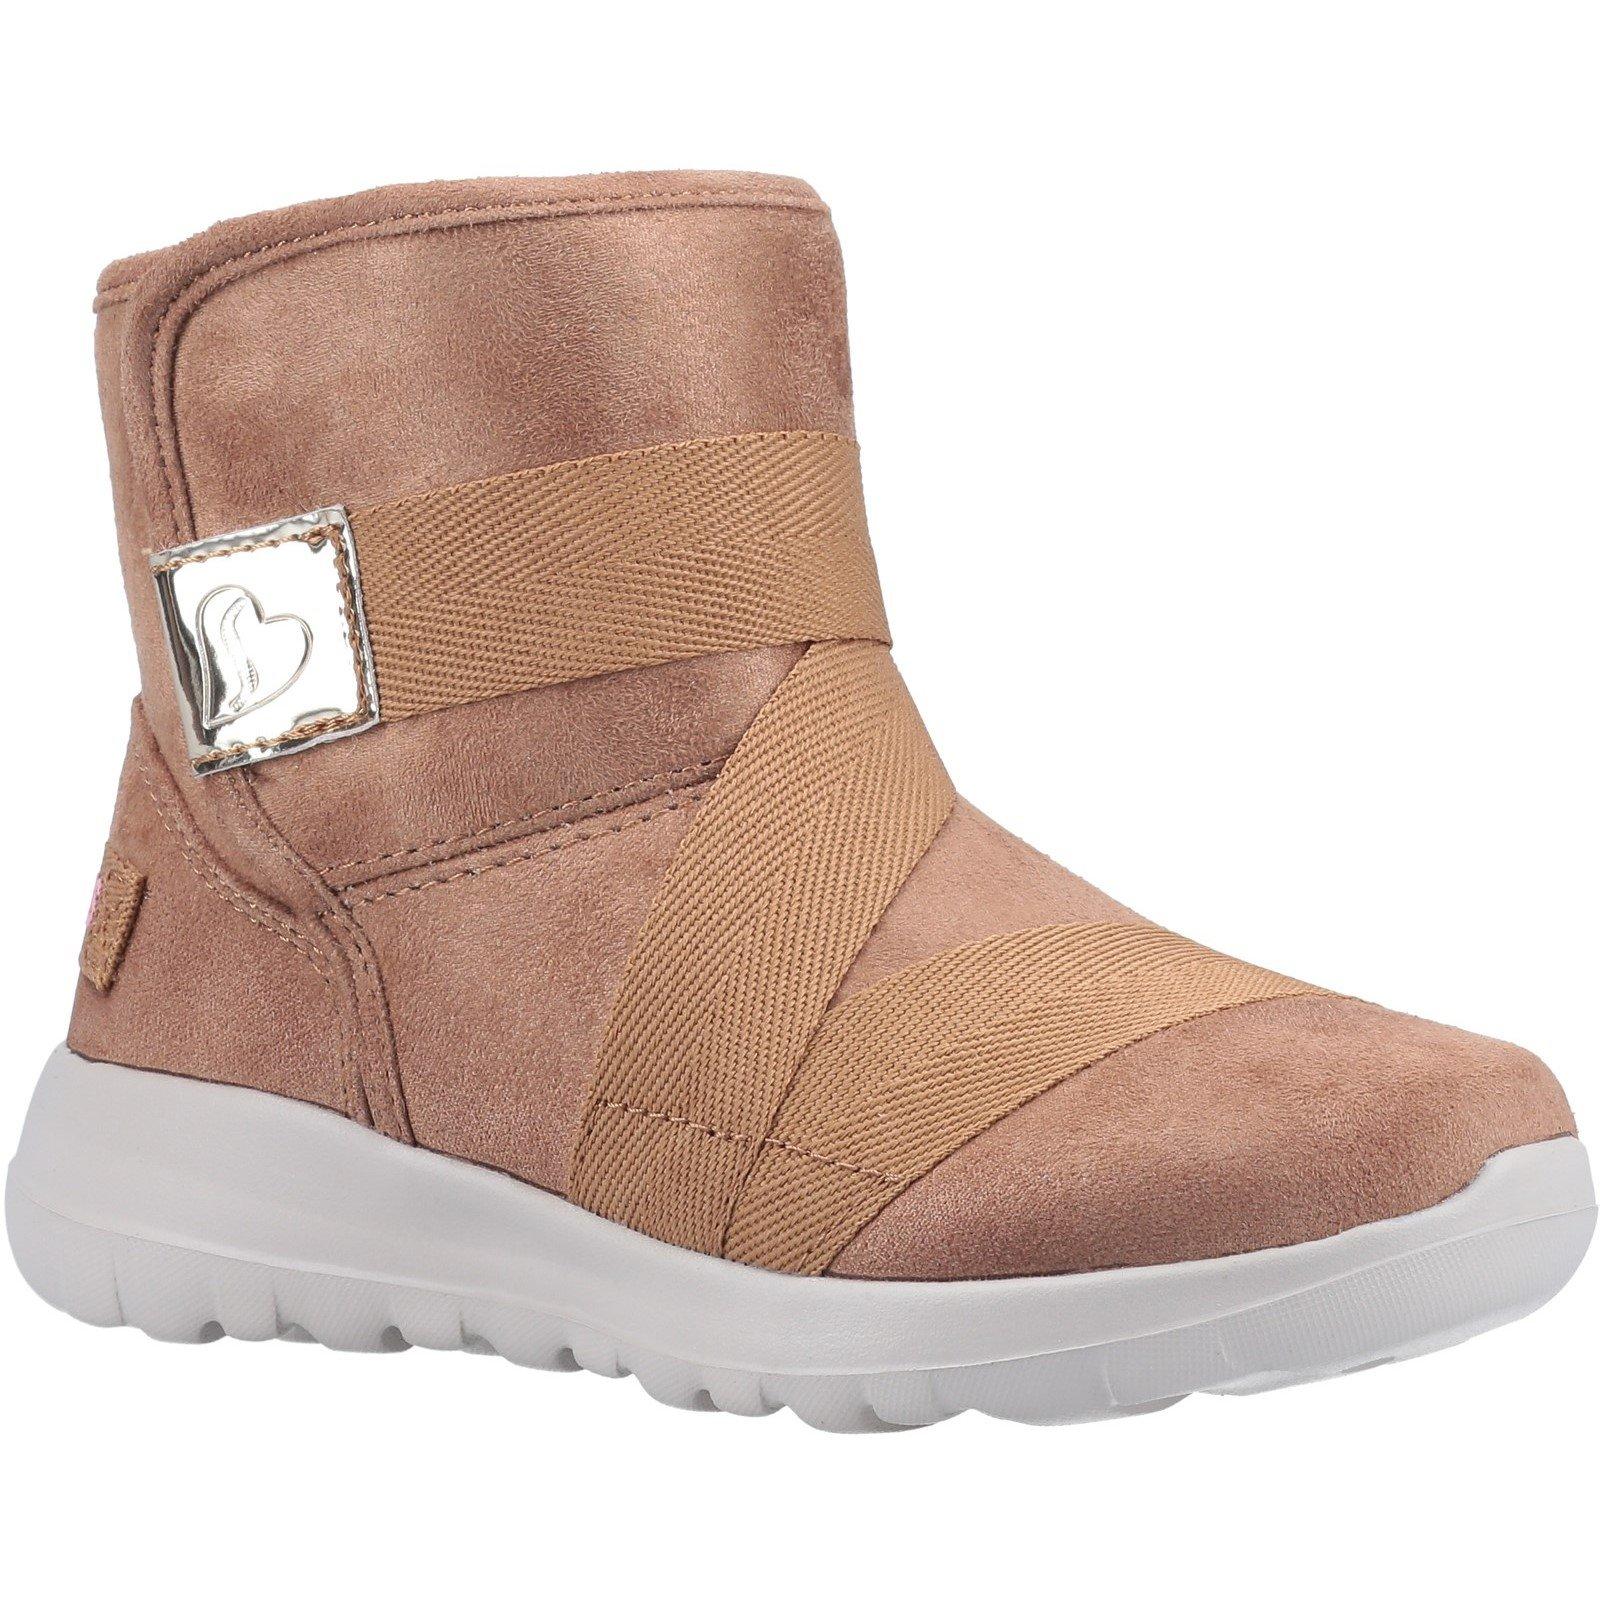 Skechers Unisex Go Walk Joy Strong Willed Ankle Boot Chestnut 31167 - Chestnut 5